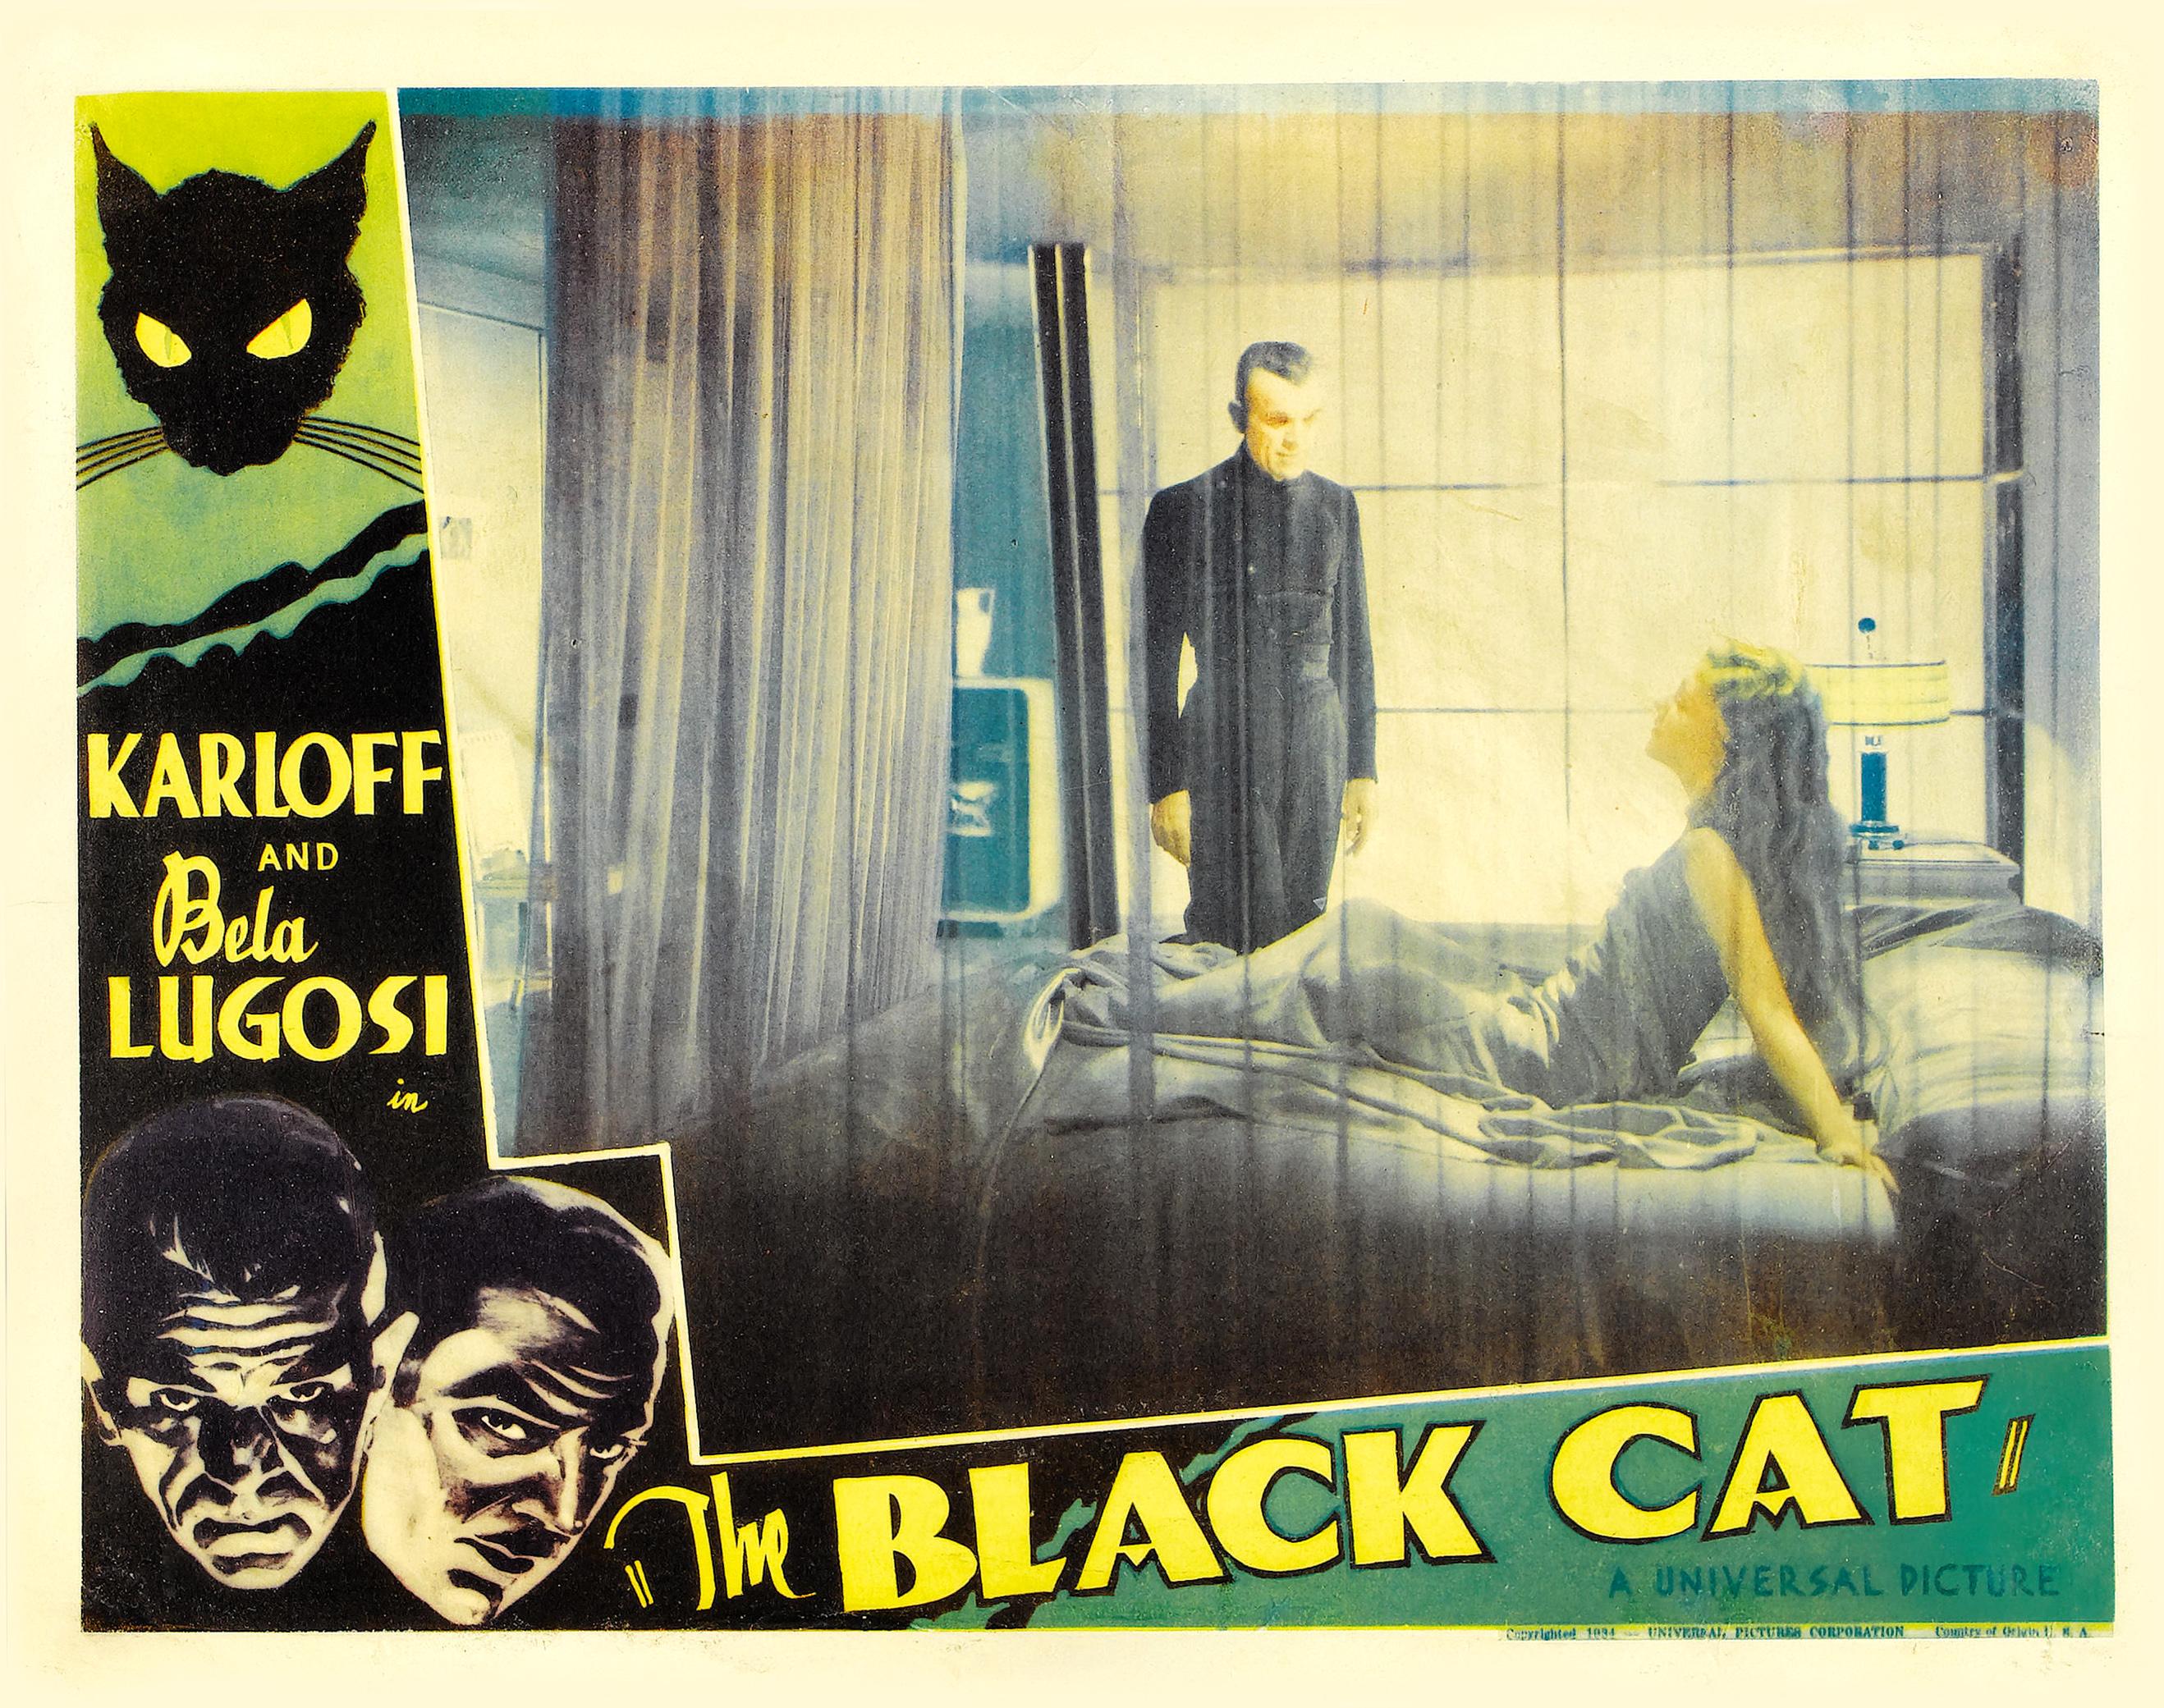 THE BLACK CAT LOBBY CARD